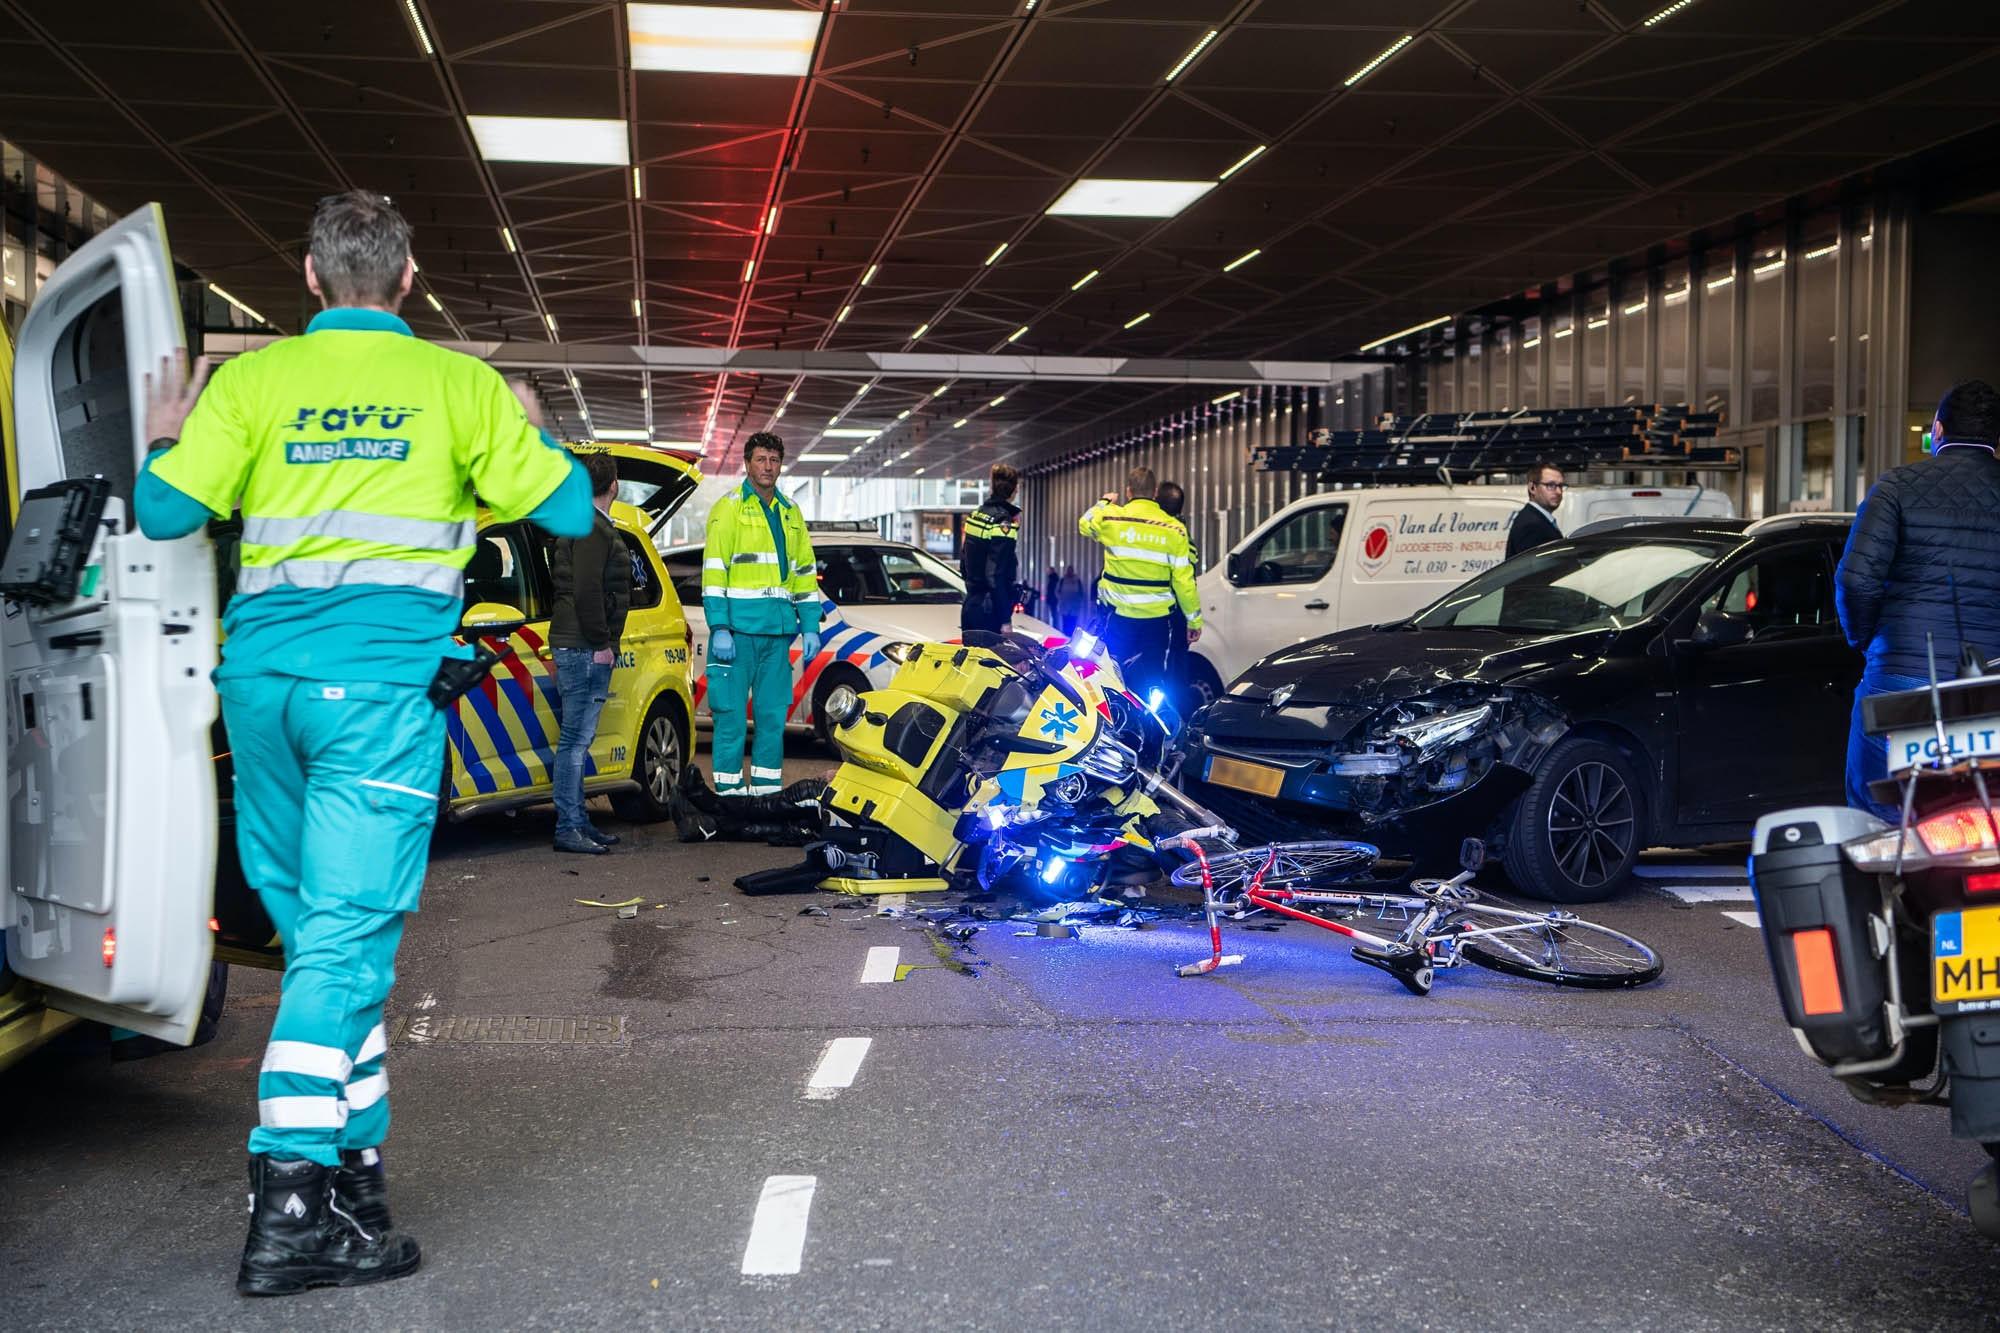 Ongeval met ambulancemotor en auto op de Catharijnesingel.